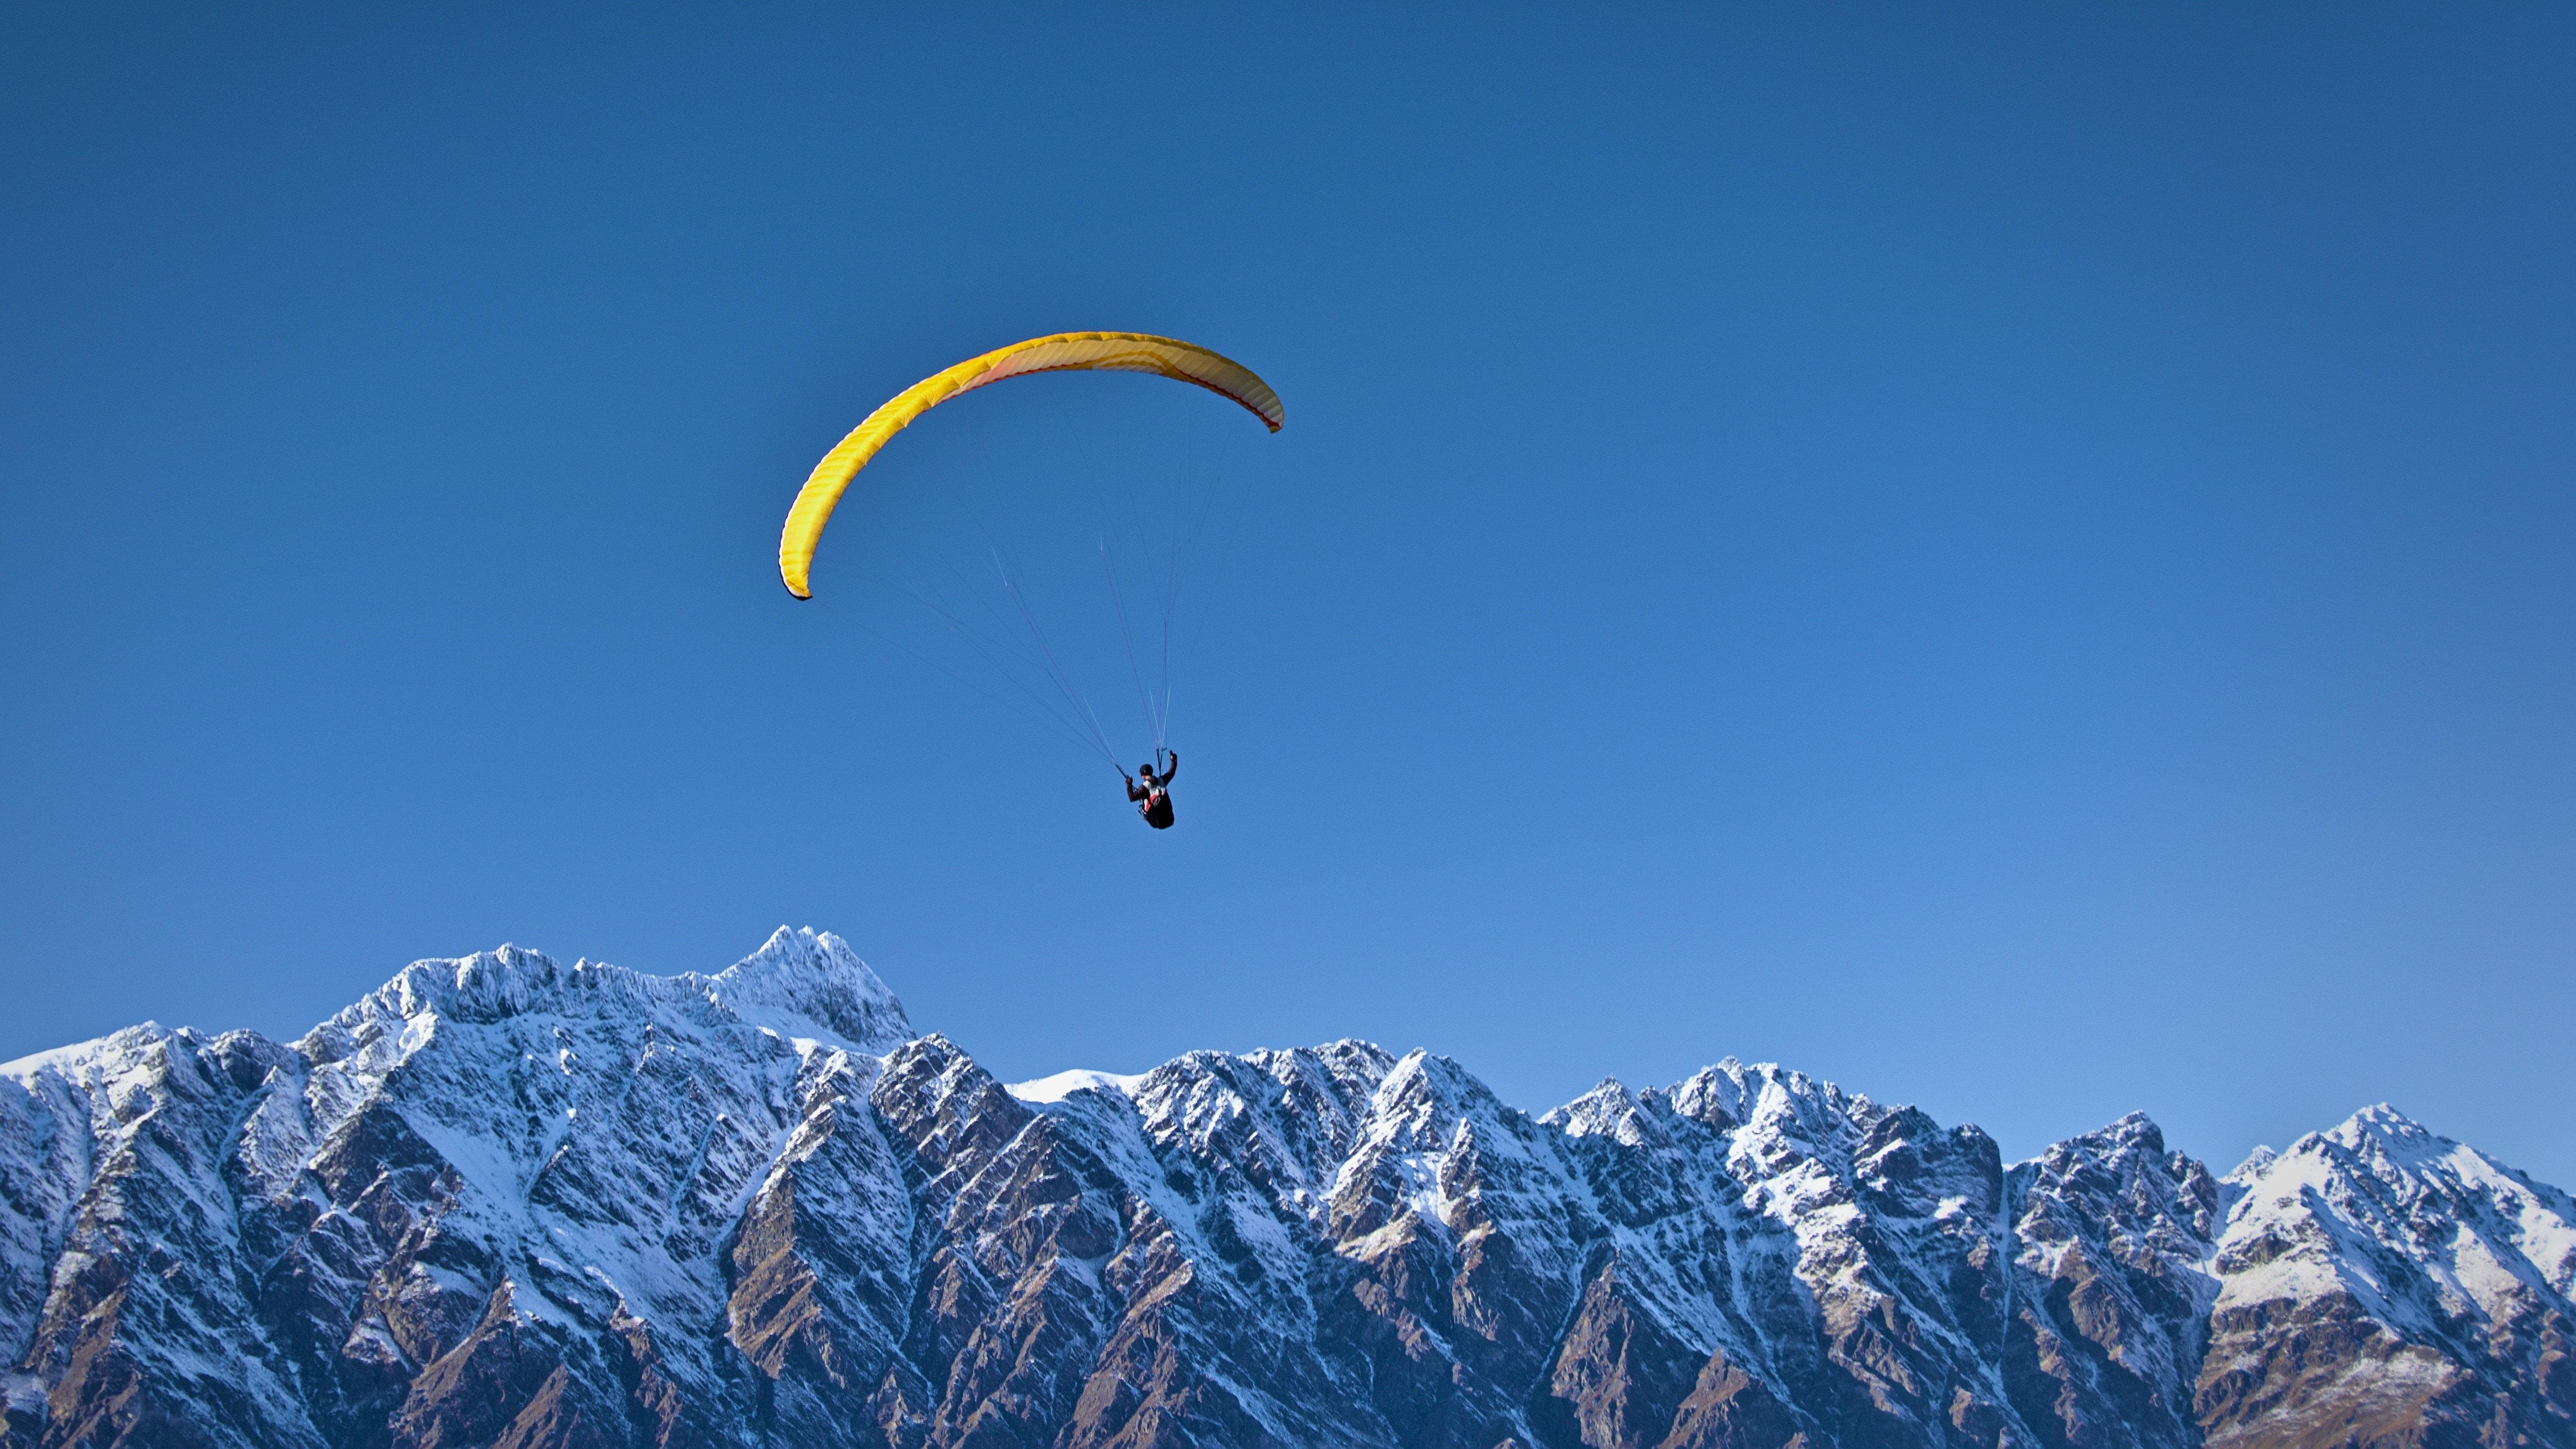 paragliding over mountain range